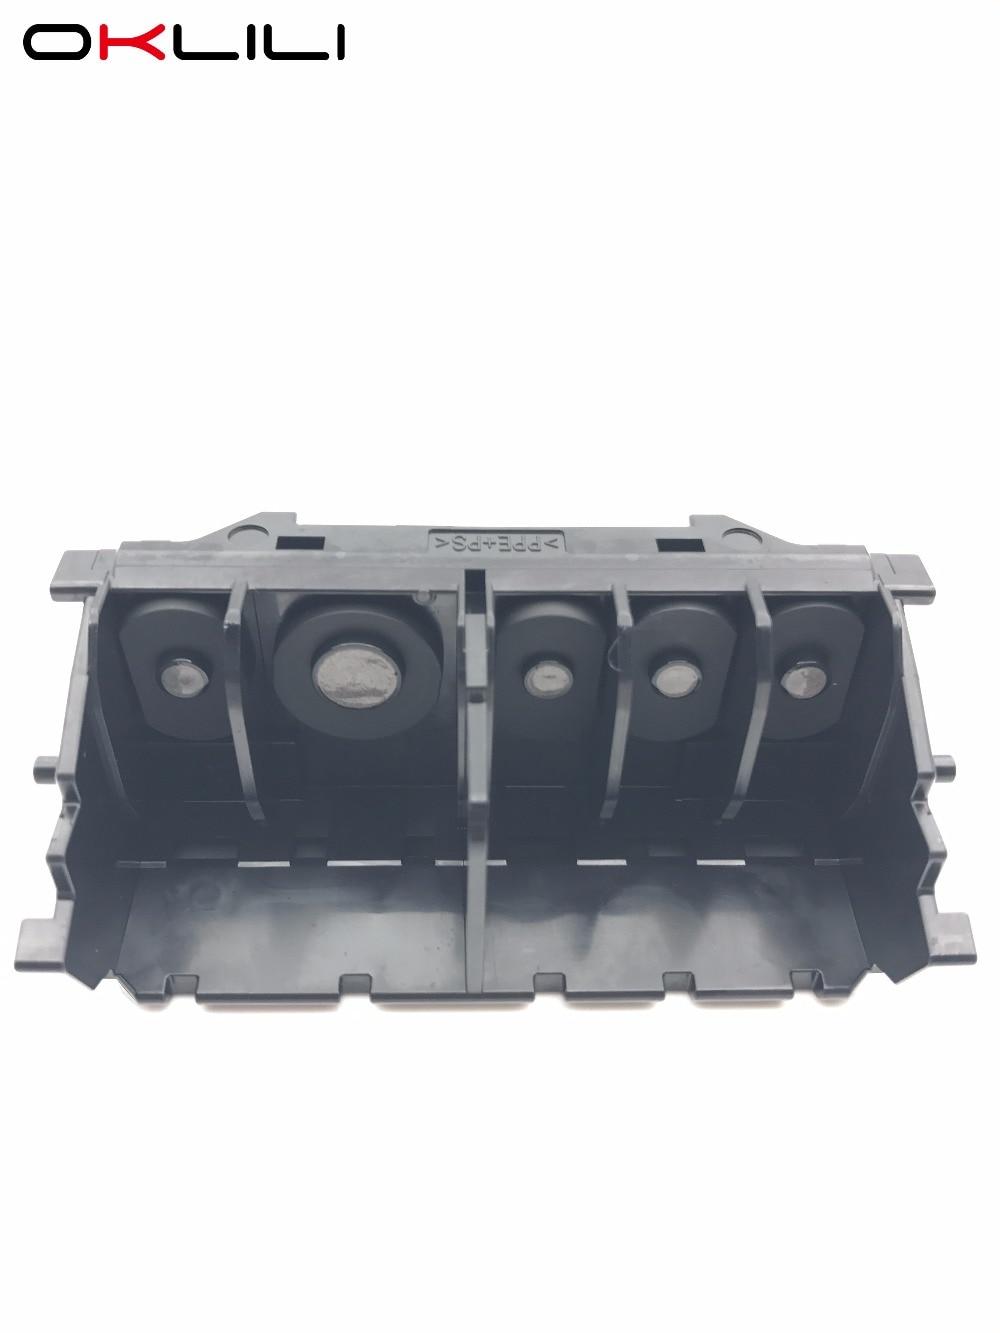 QY6-0082 Printhead Print Head for Canon iP7200 iP7210 iP7220 iP7240 iP7250 MG5410 MG5420 MG5440 MG5450 MG5460 MG5470 MG5500